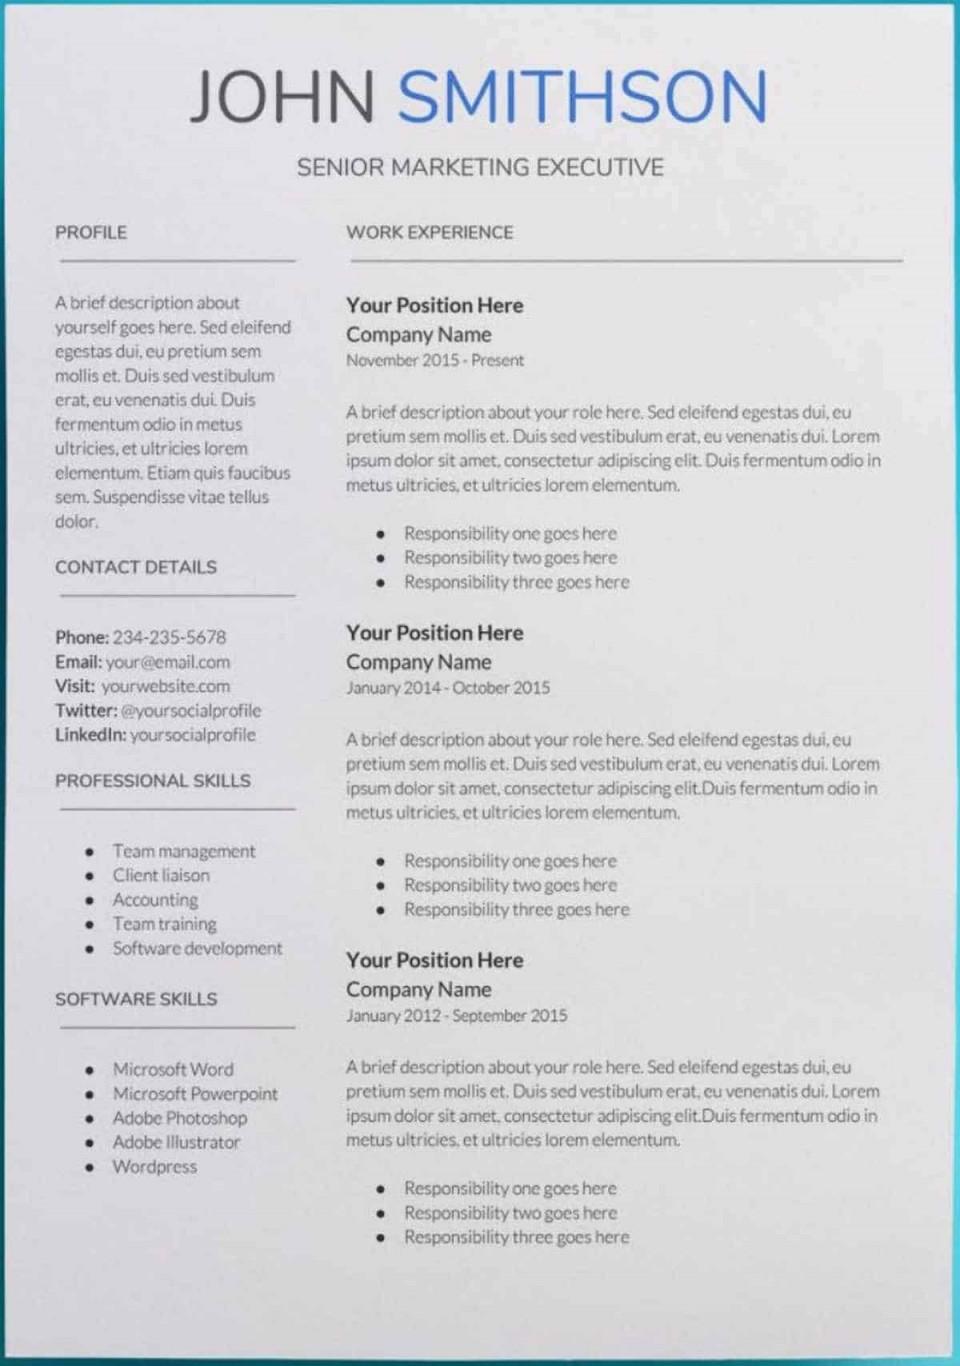 007 Sensational Professional Cv Template Free Online Photo  Resume960